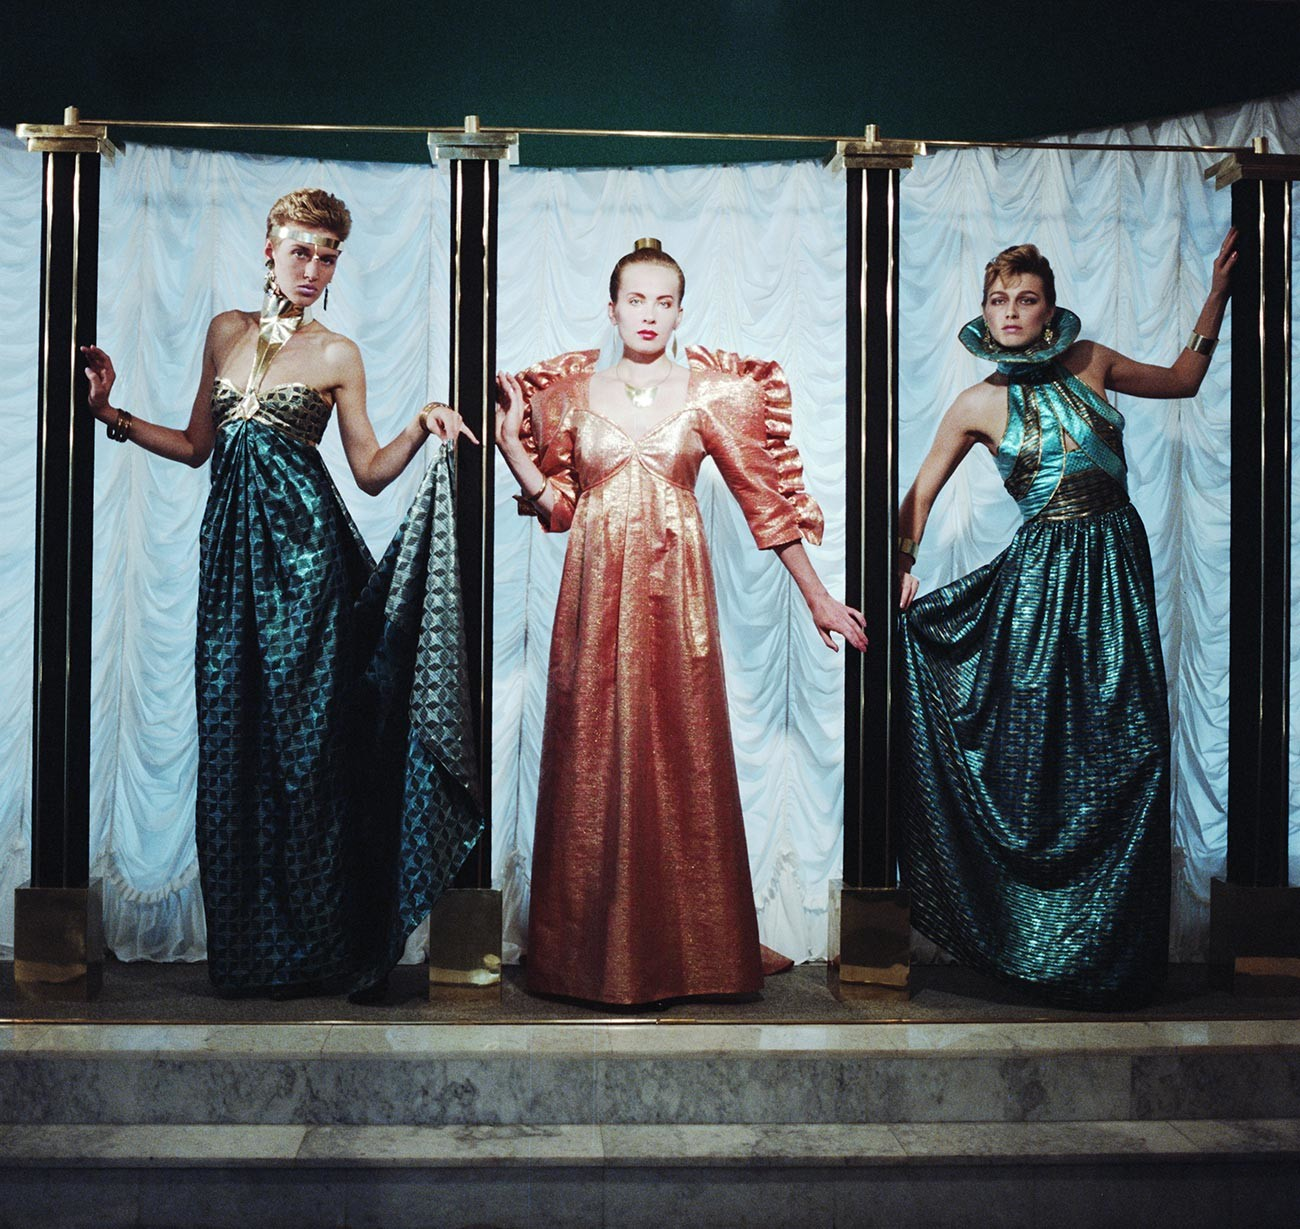 Arbat Fashion House, 1989. Evening dresses of colored brocade.